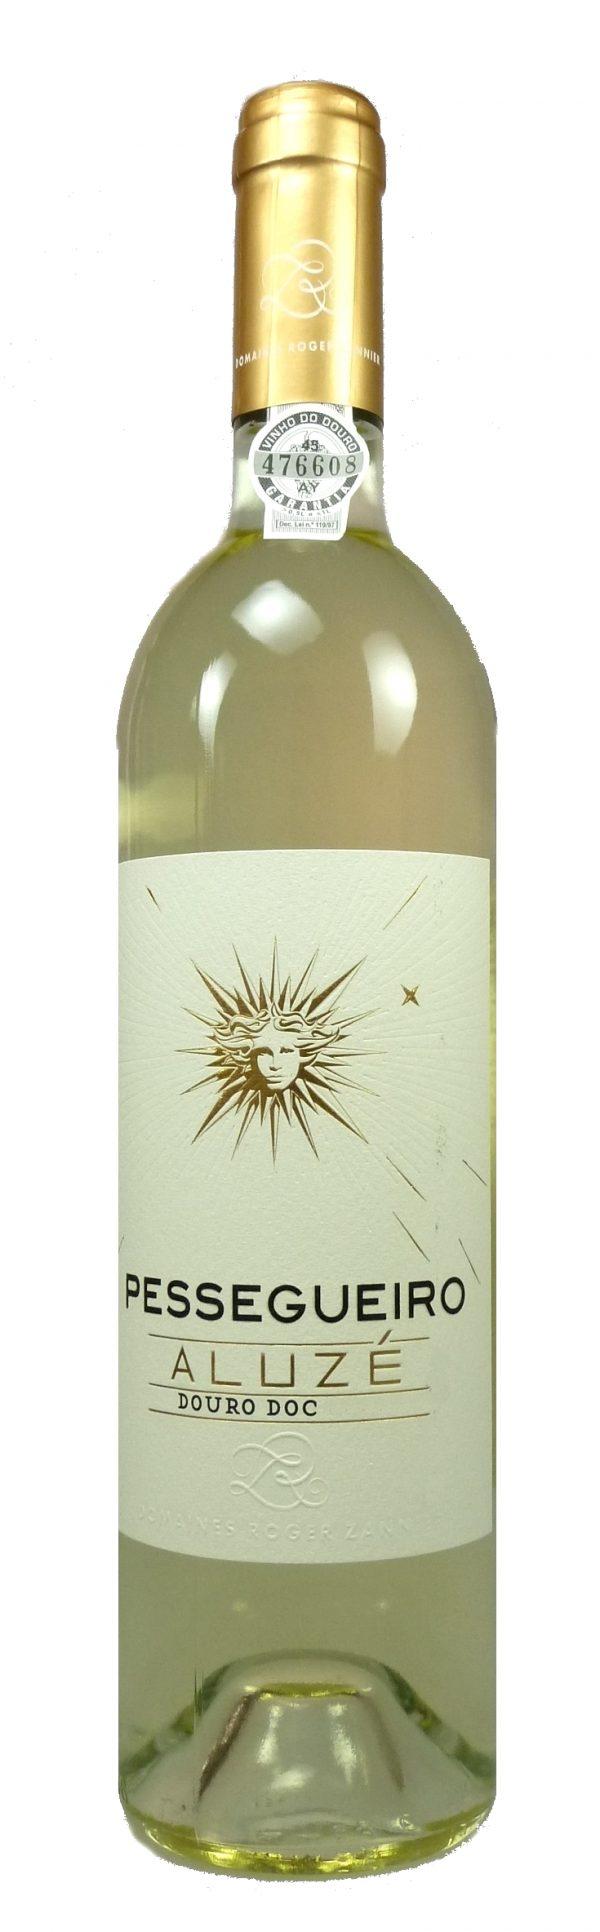 6 Flaschen 2018 Aluzé Branco